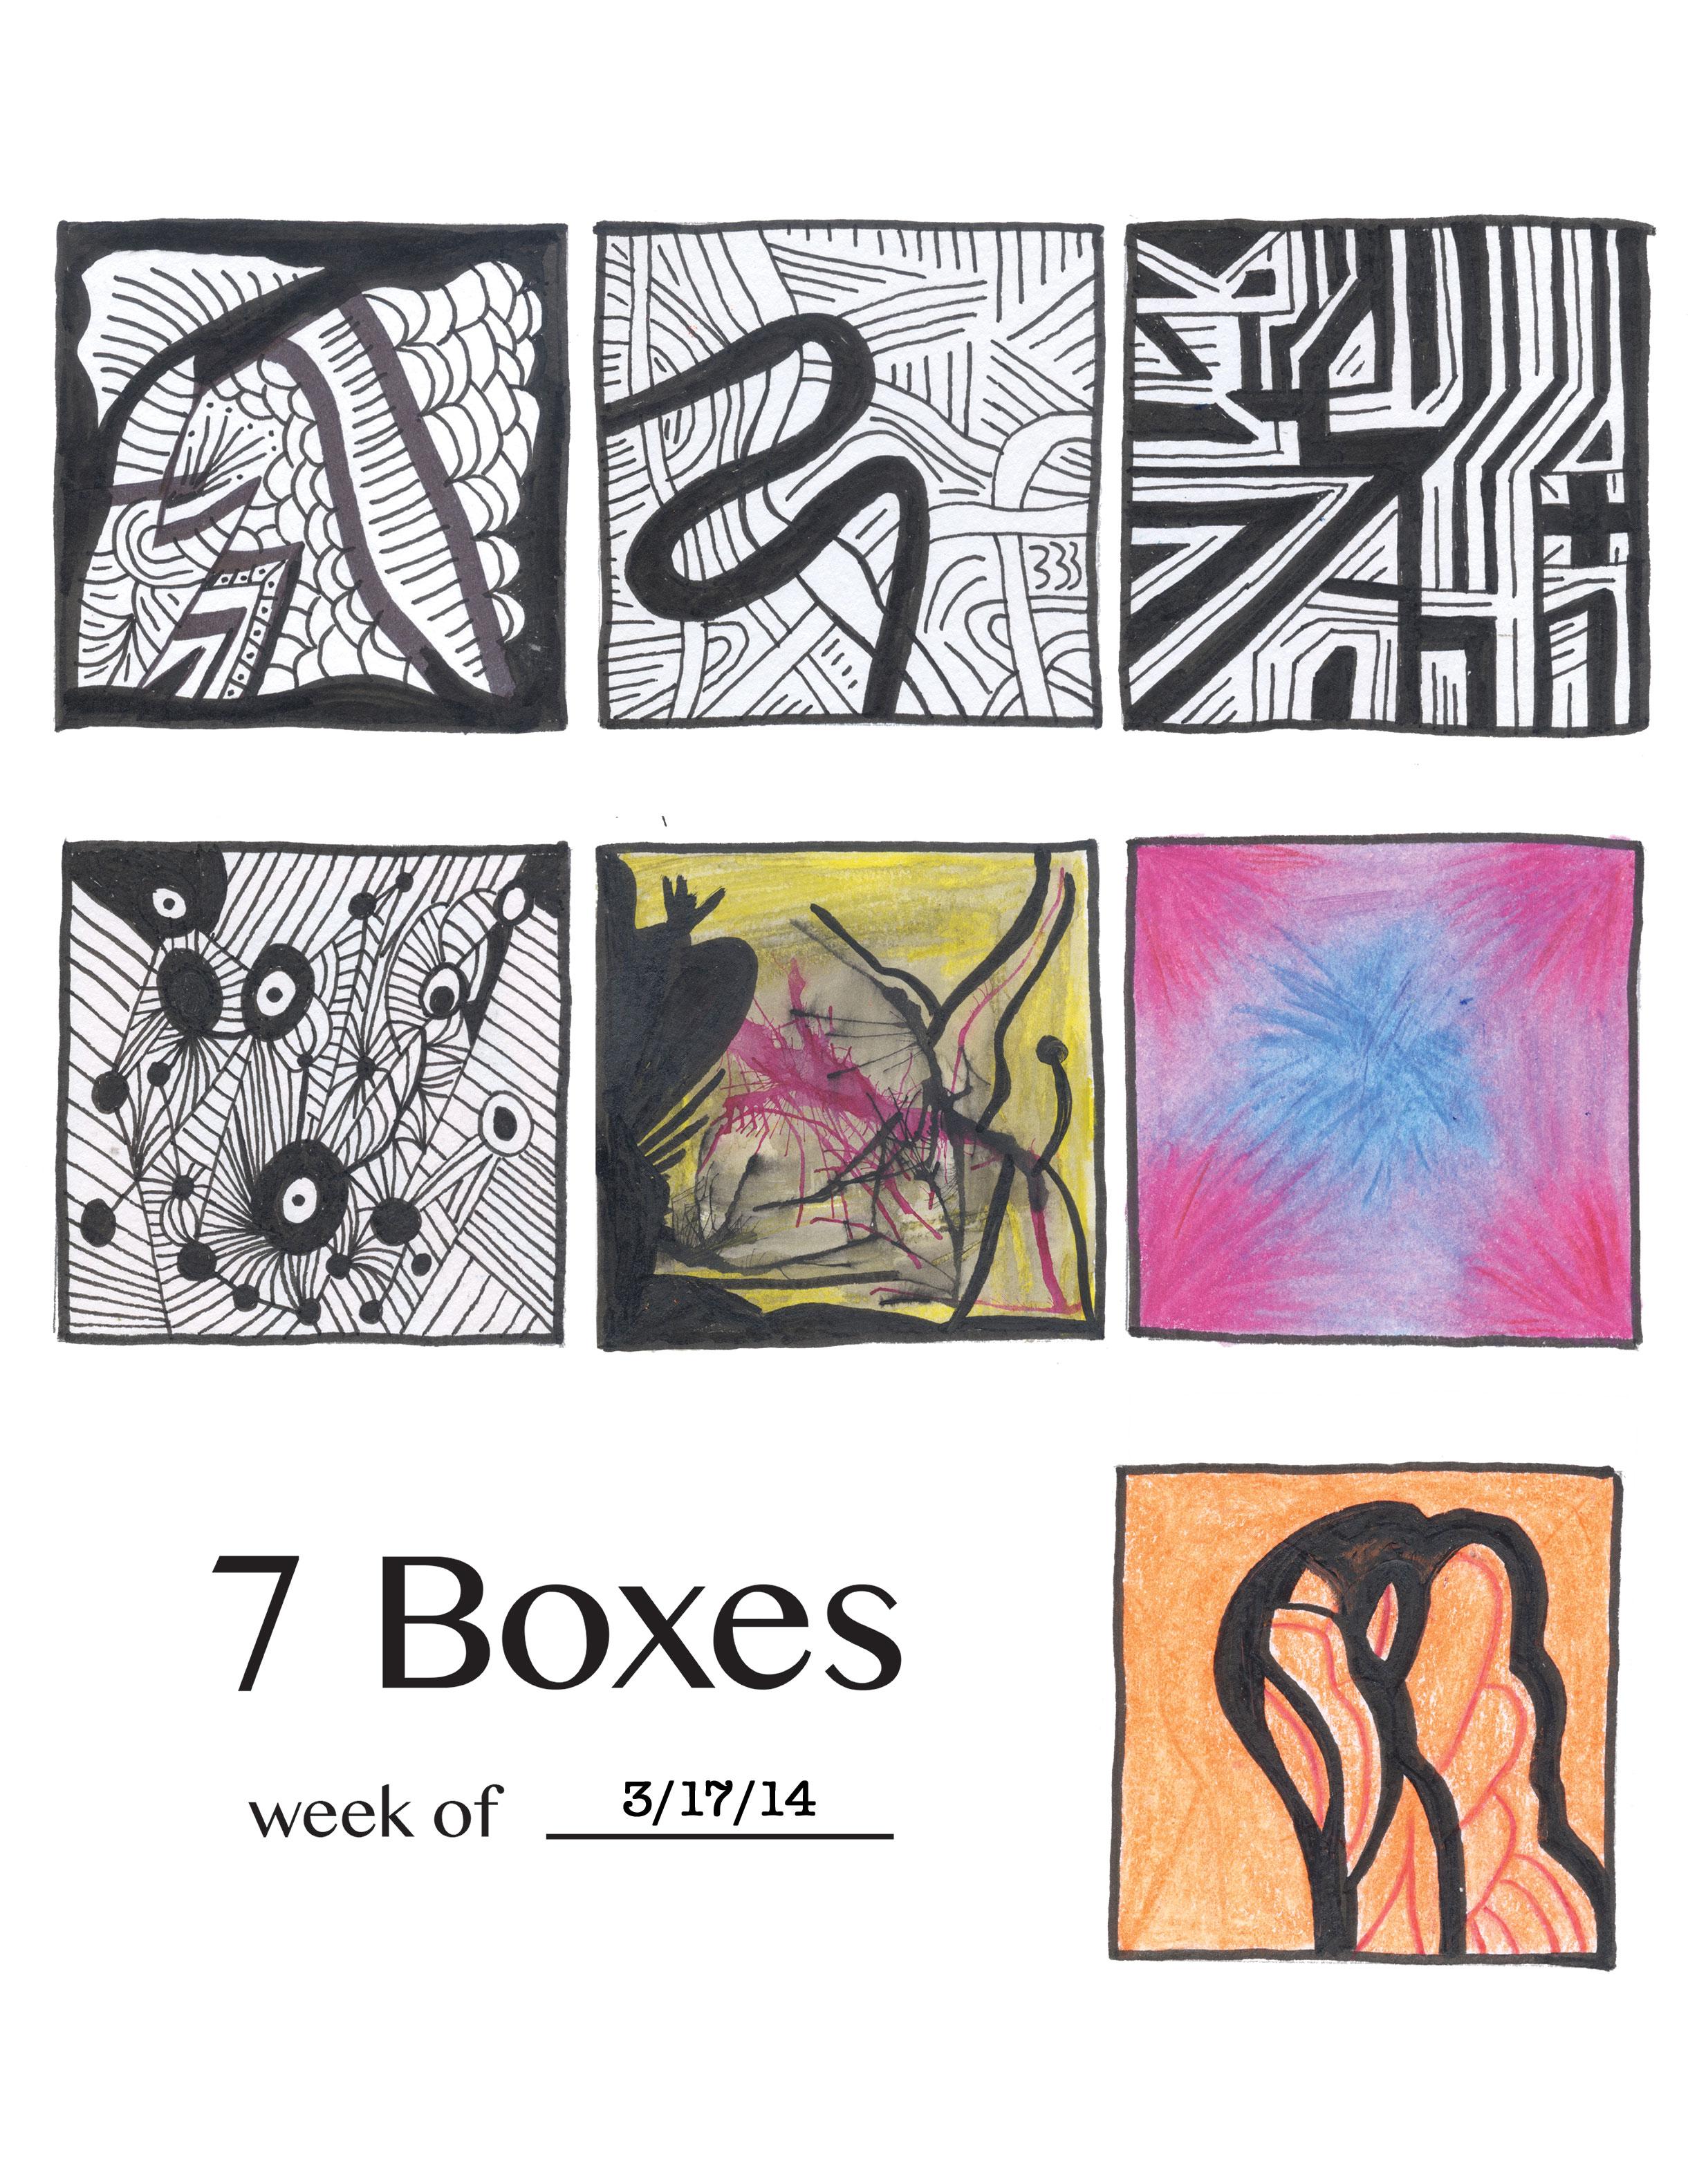 20140317_7_Boxes#16_72